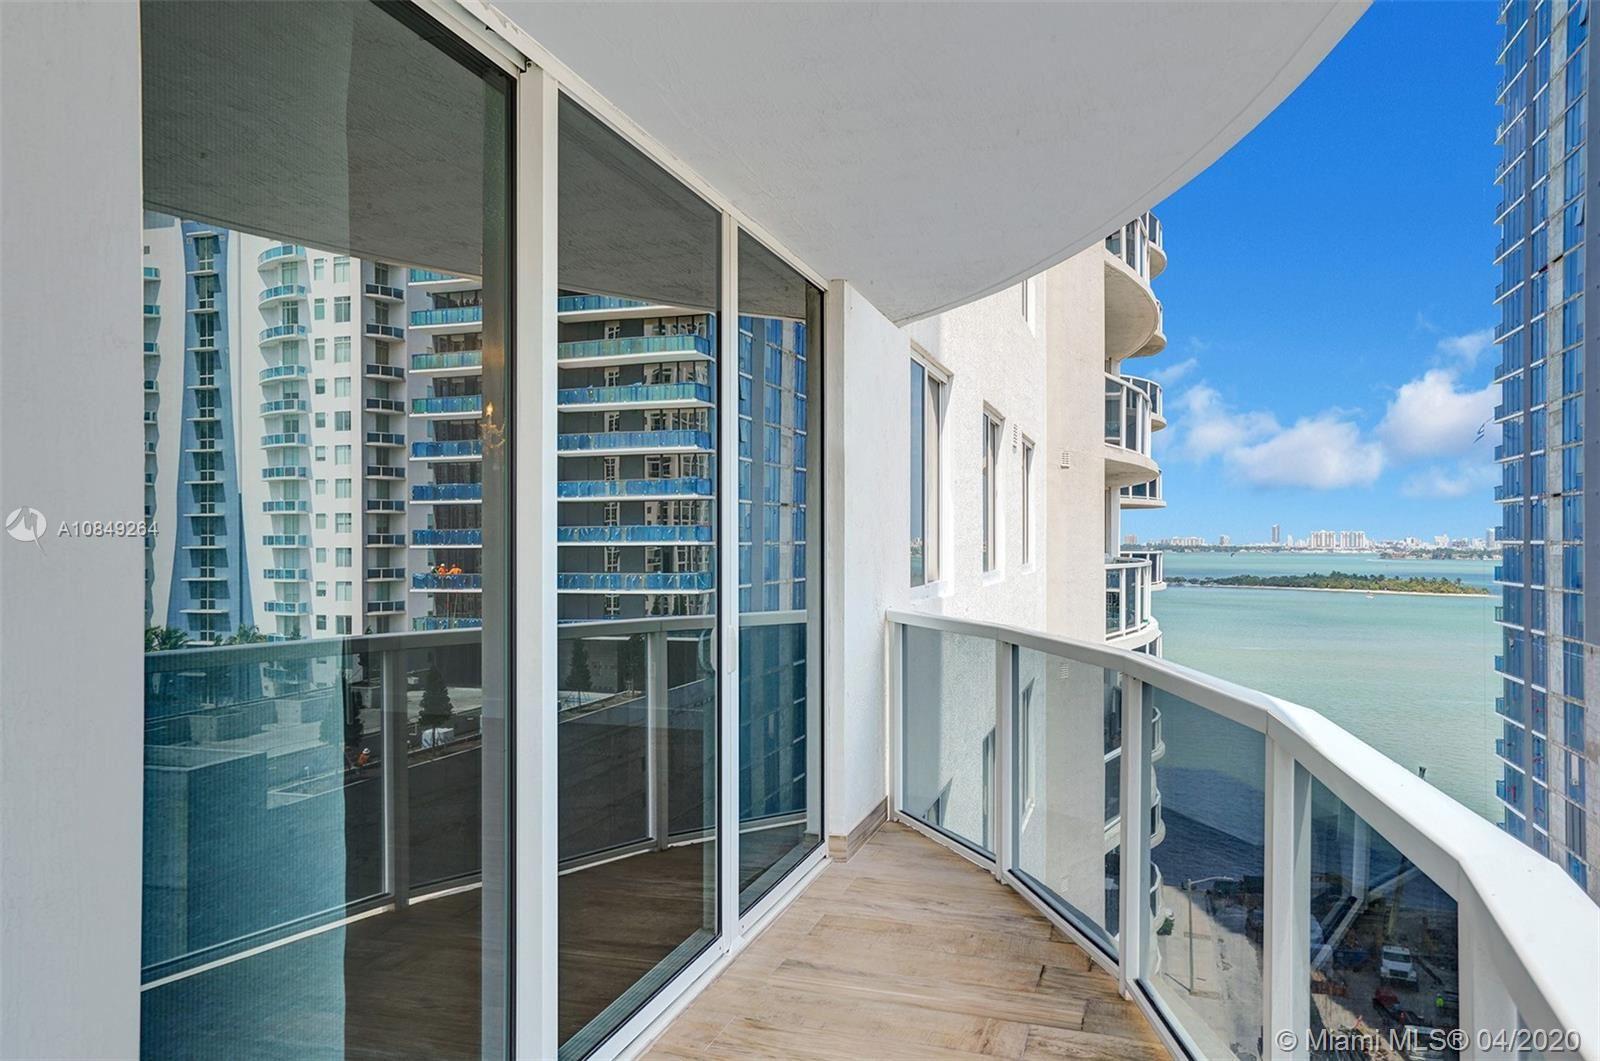 601 NE 23rd St #1405, Miami, FL 33137 - #: A10849264